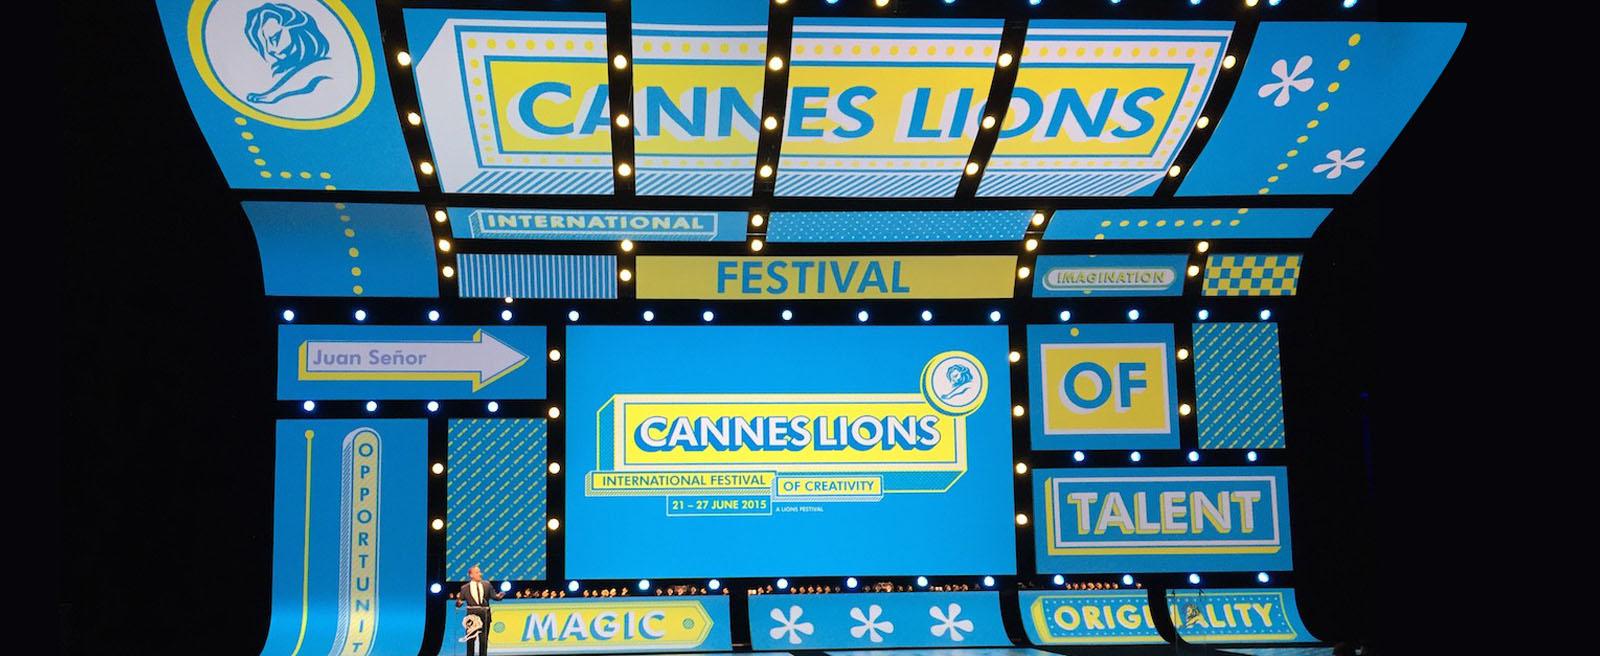 Pohvale za uspjeh na Cannesu